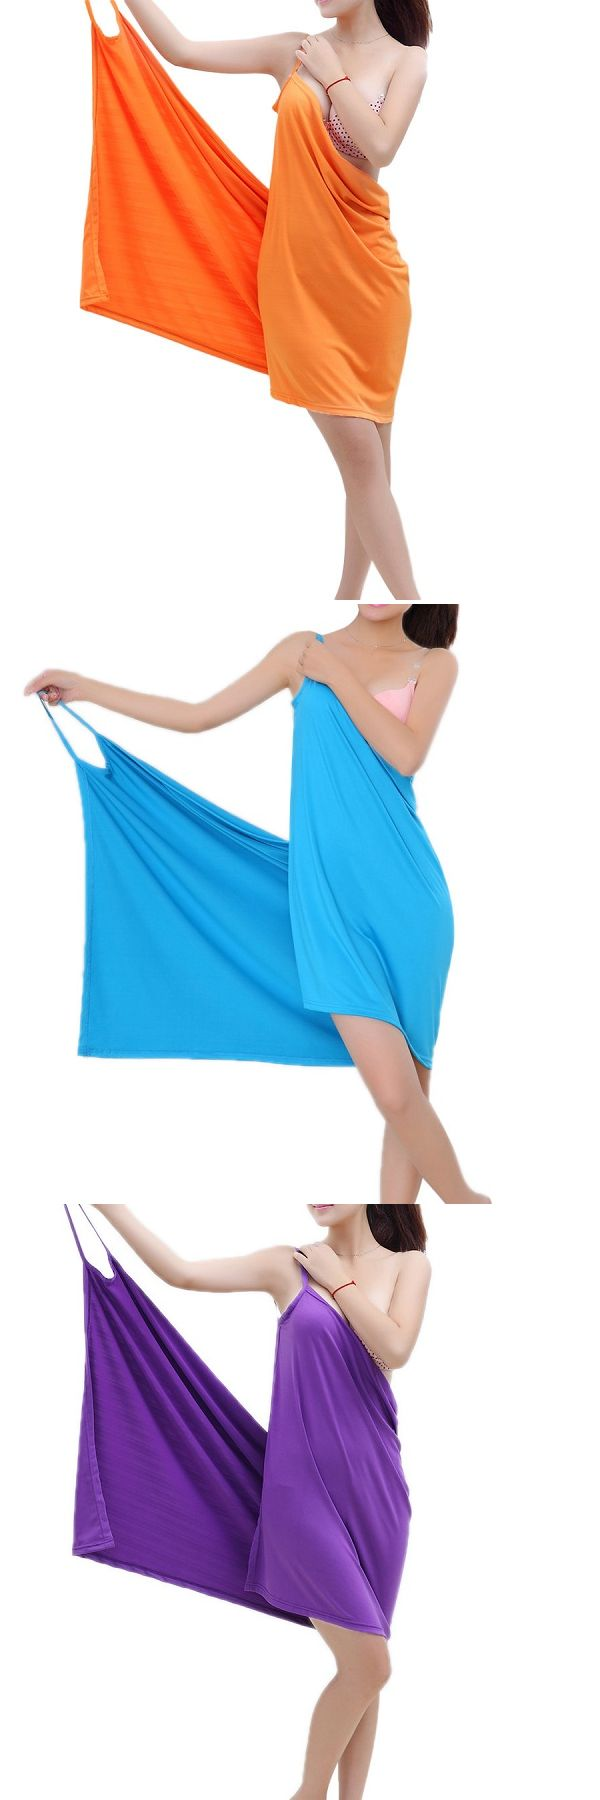 Summer Beach Soft Ice Silk Sexy Hot Able Wear Deep V Spa BathRobe Bath Towel Women Skirt